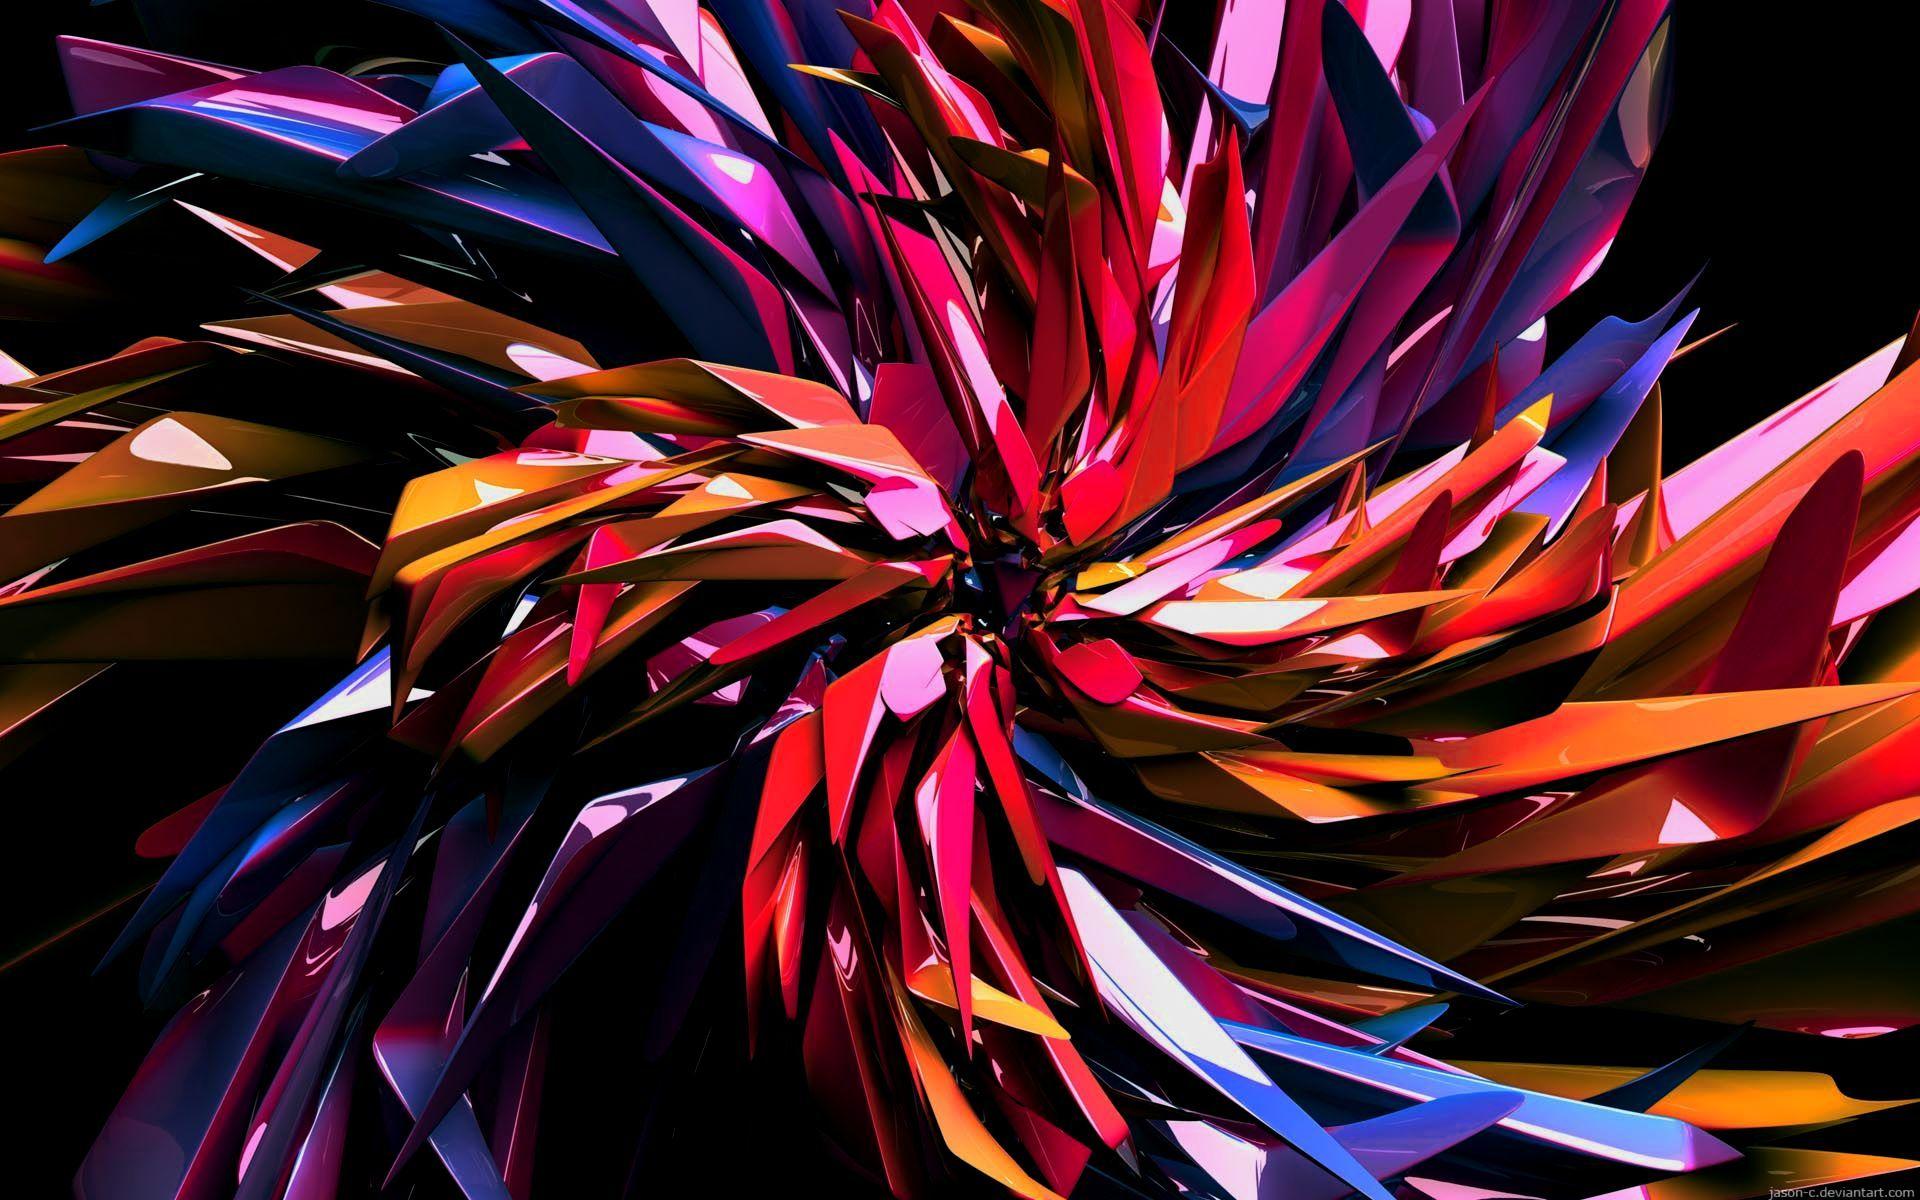 Ultra Hd Fine 4k Photo Editing Space Hd Background Image Artis Bertato Seni Gelap Wallpaper Ponsel